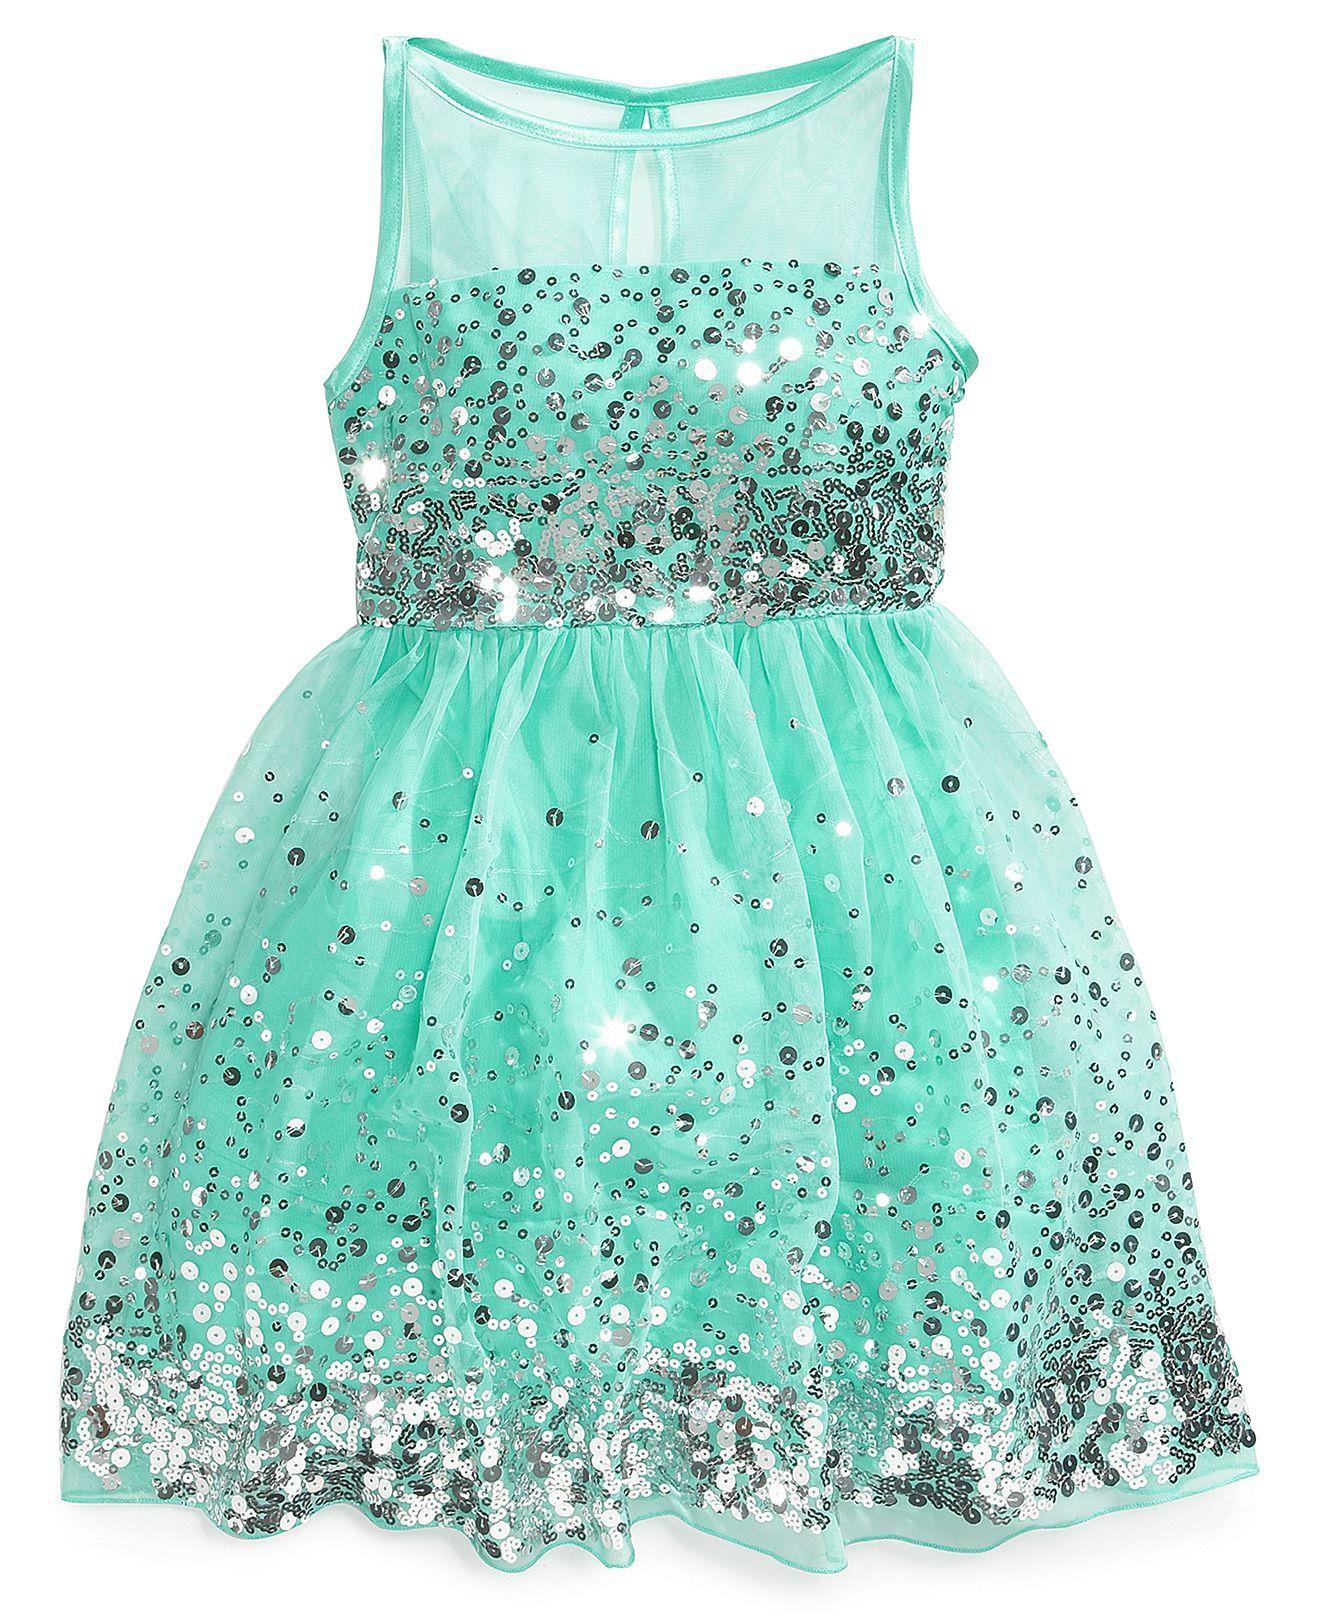 Crystal Doll Sequin Illusion Dress, Big Girls | Illusion dress, Kids ...